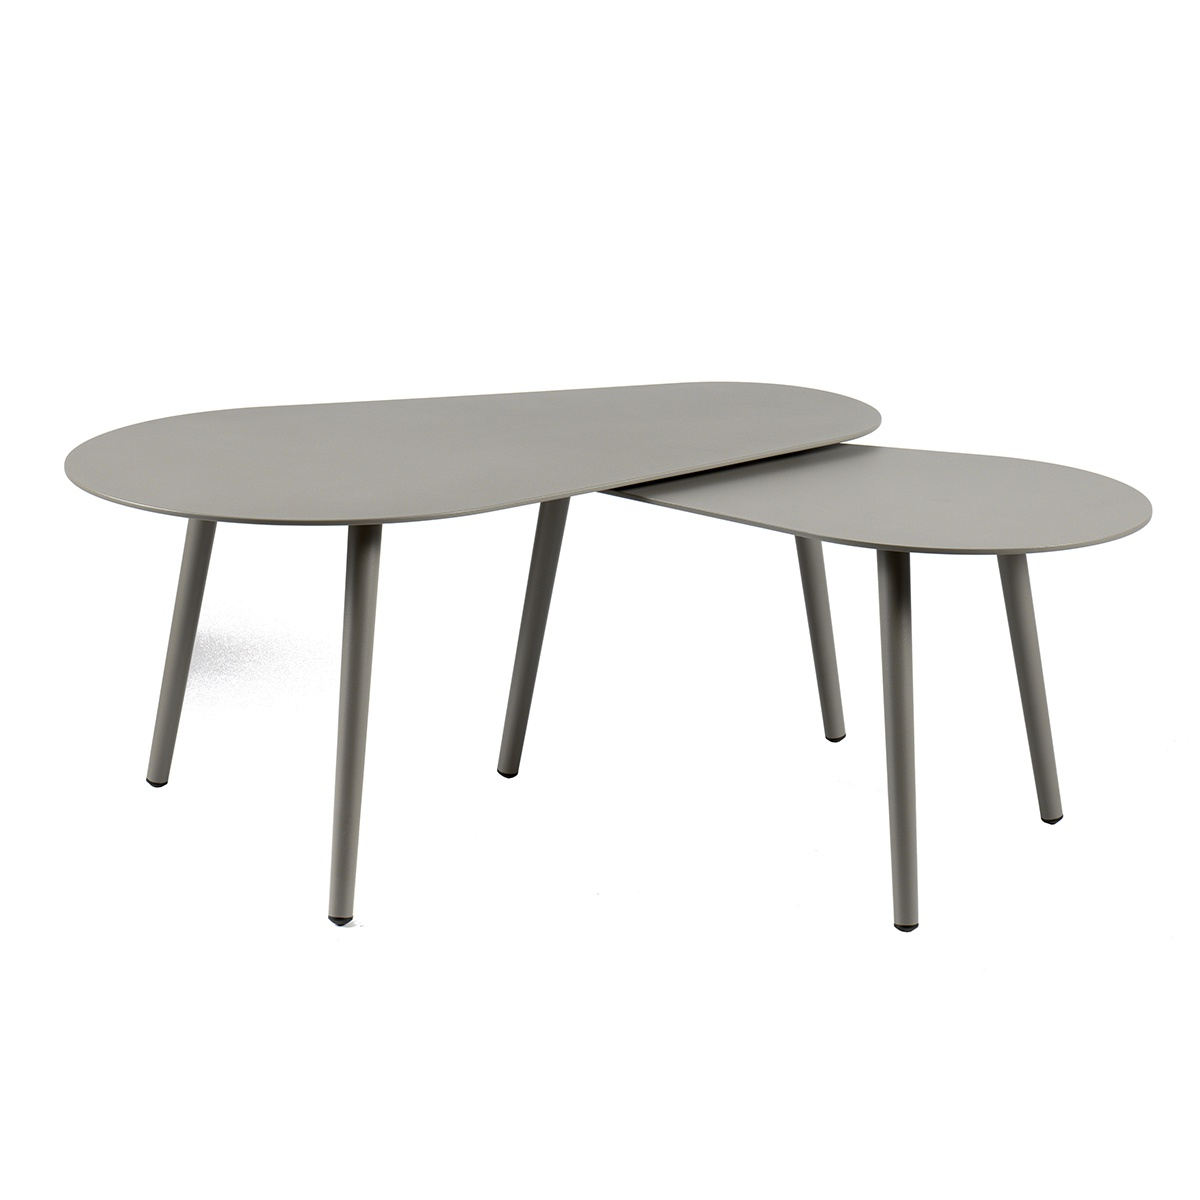 Tables basses gigognes en aluminium gris